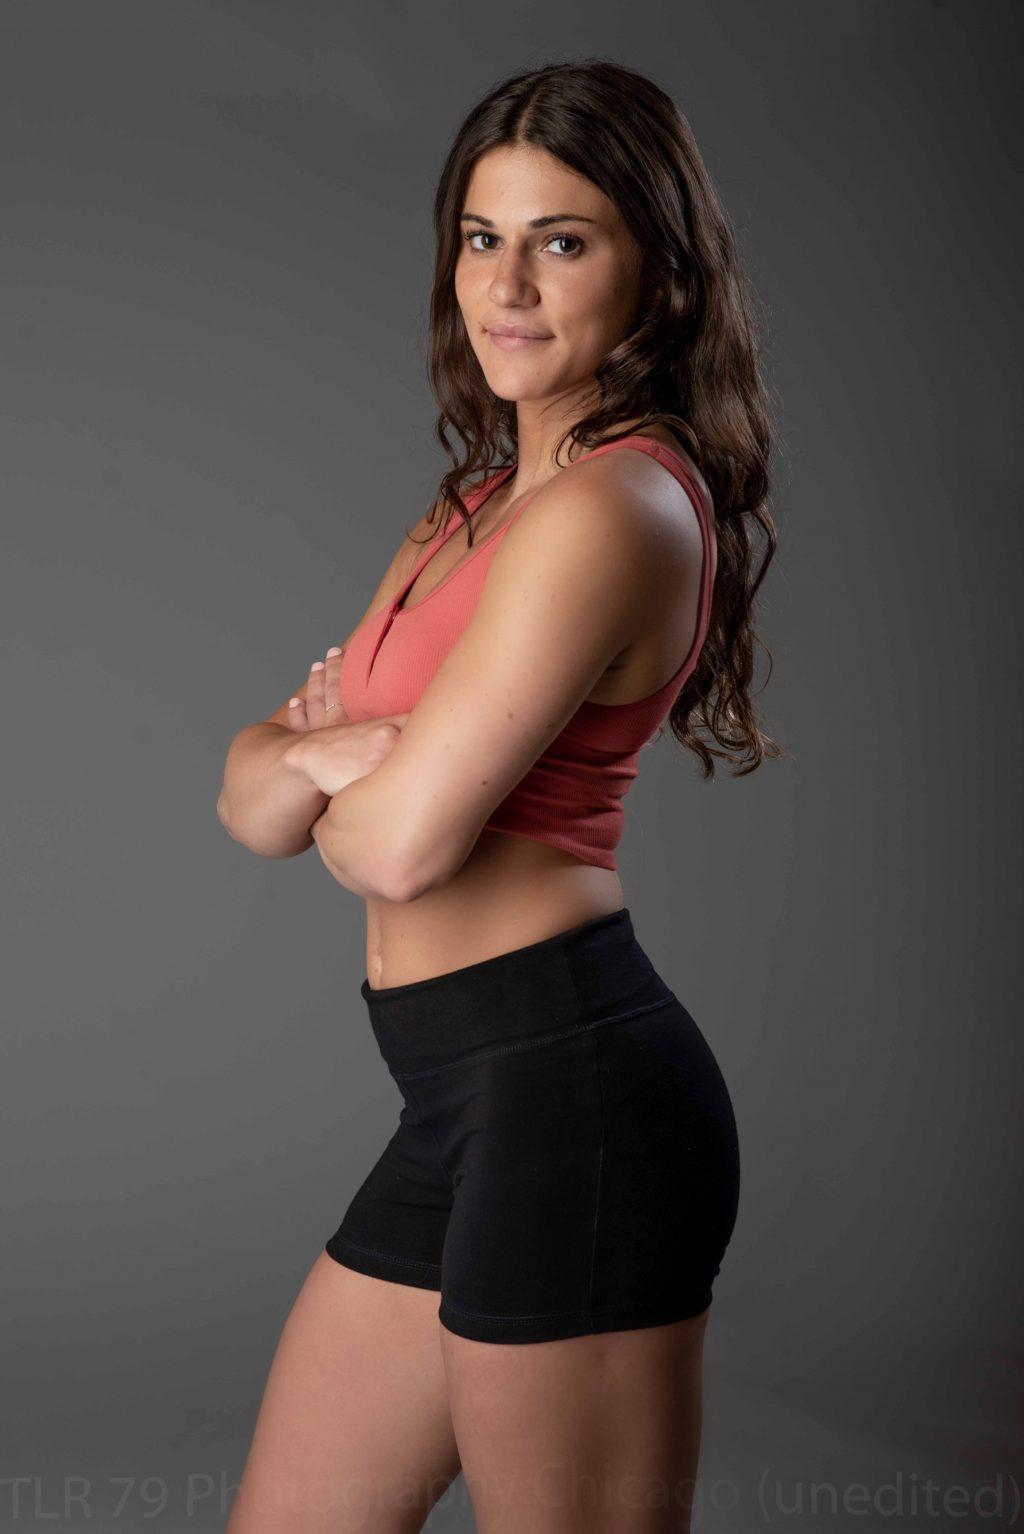 Personal Trainer Chicago, Illinois - Ellie Heifitz